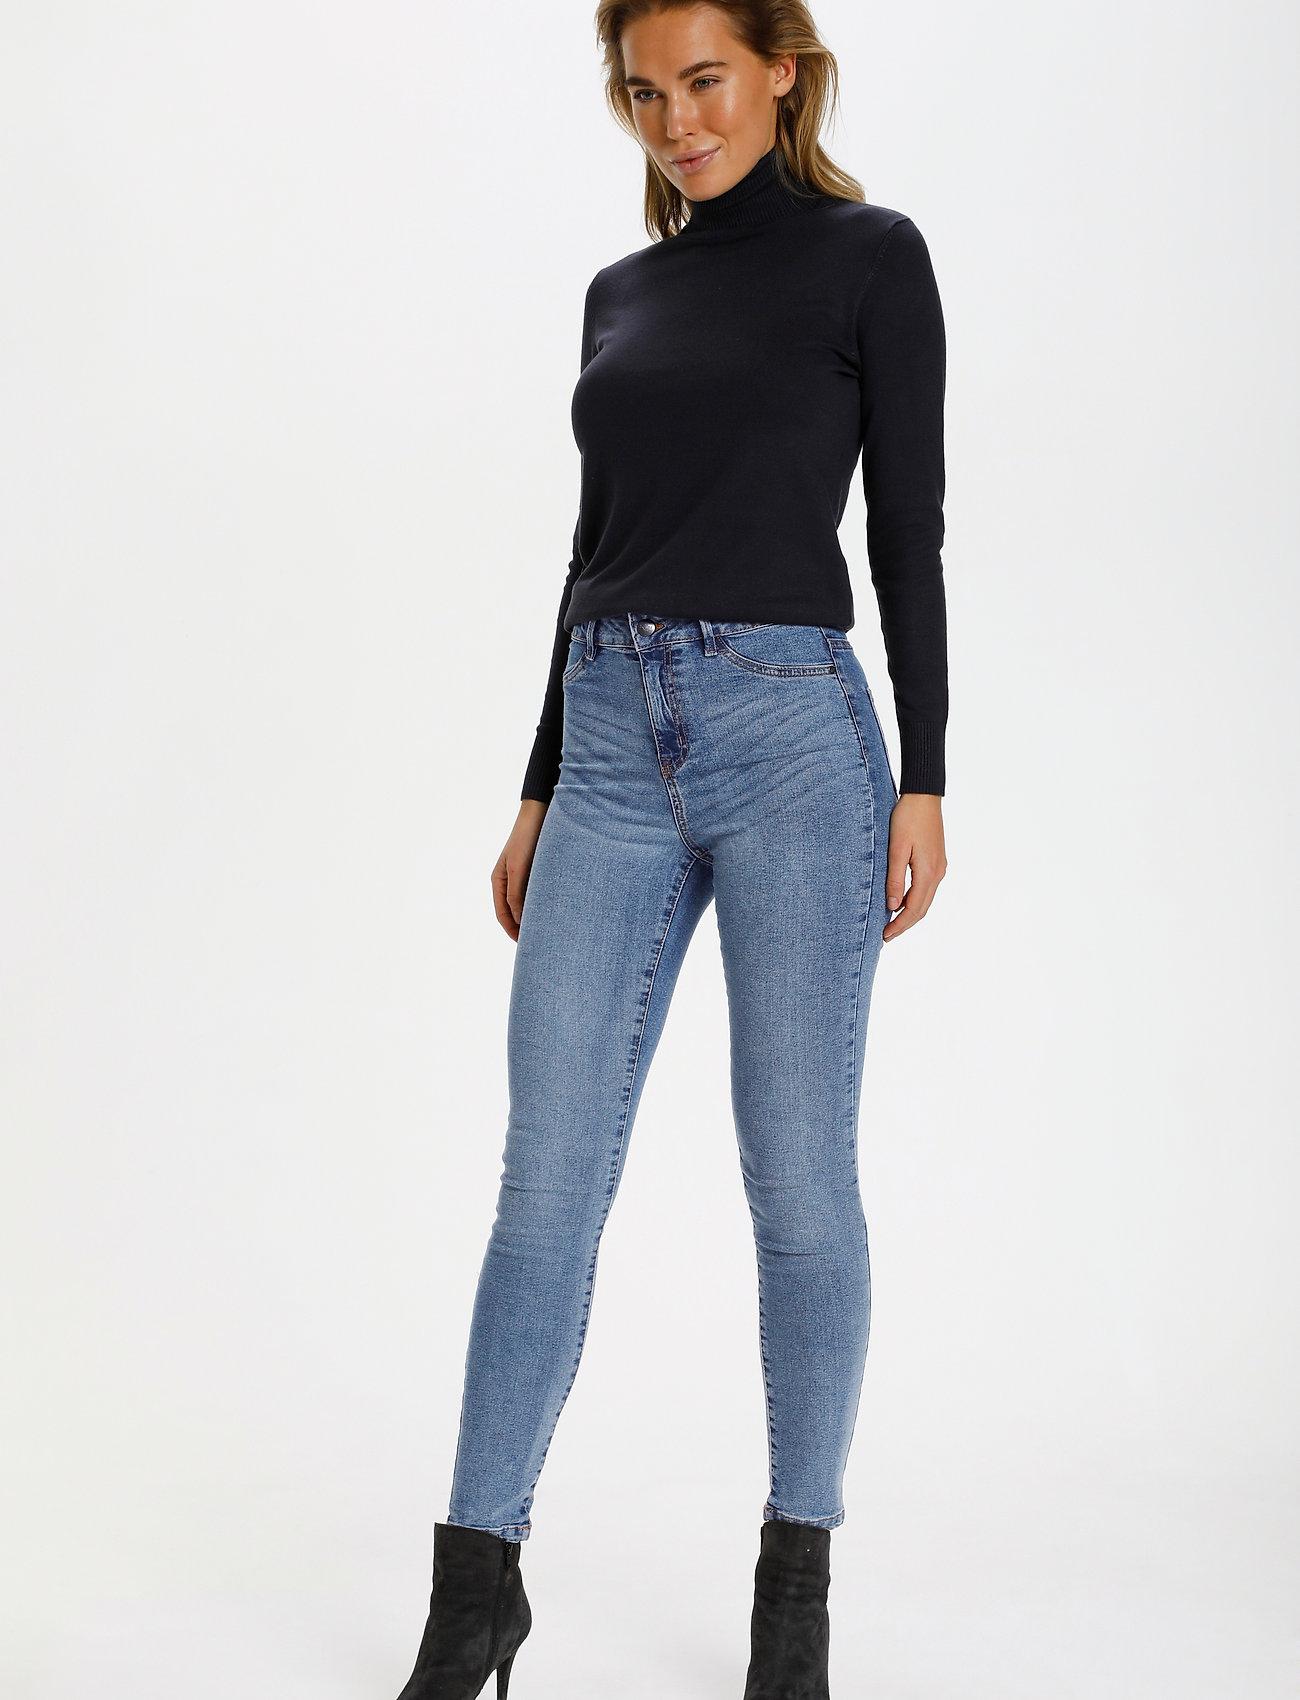 Saint Tropez - T5757, TinnaSZ Jeans - skinny jeans - light blue denim - 3